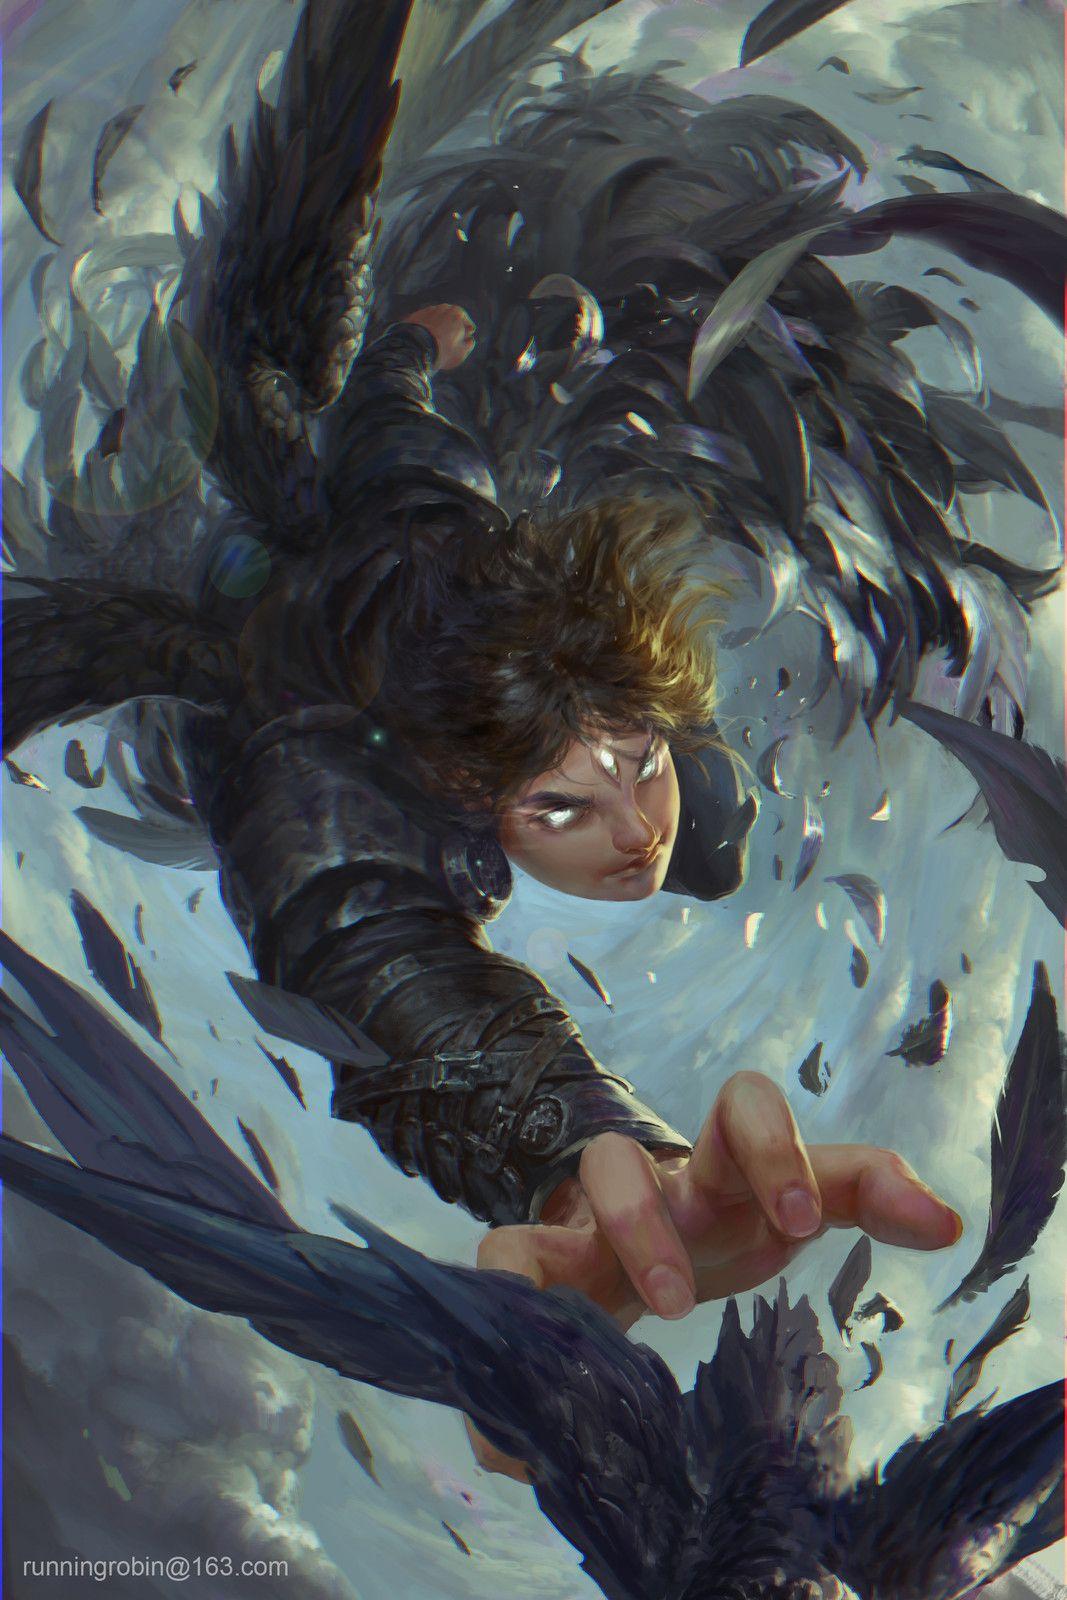 catch the crow, Robin Ruan on ArtStation at https://www.artstation.com/artwork/31WQA